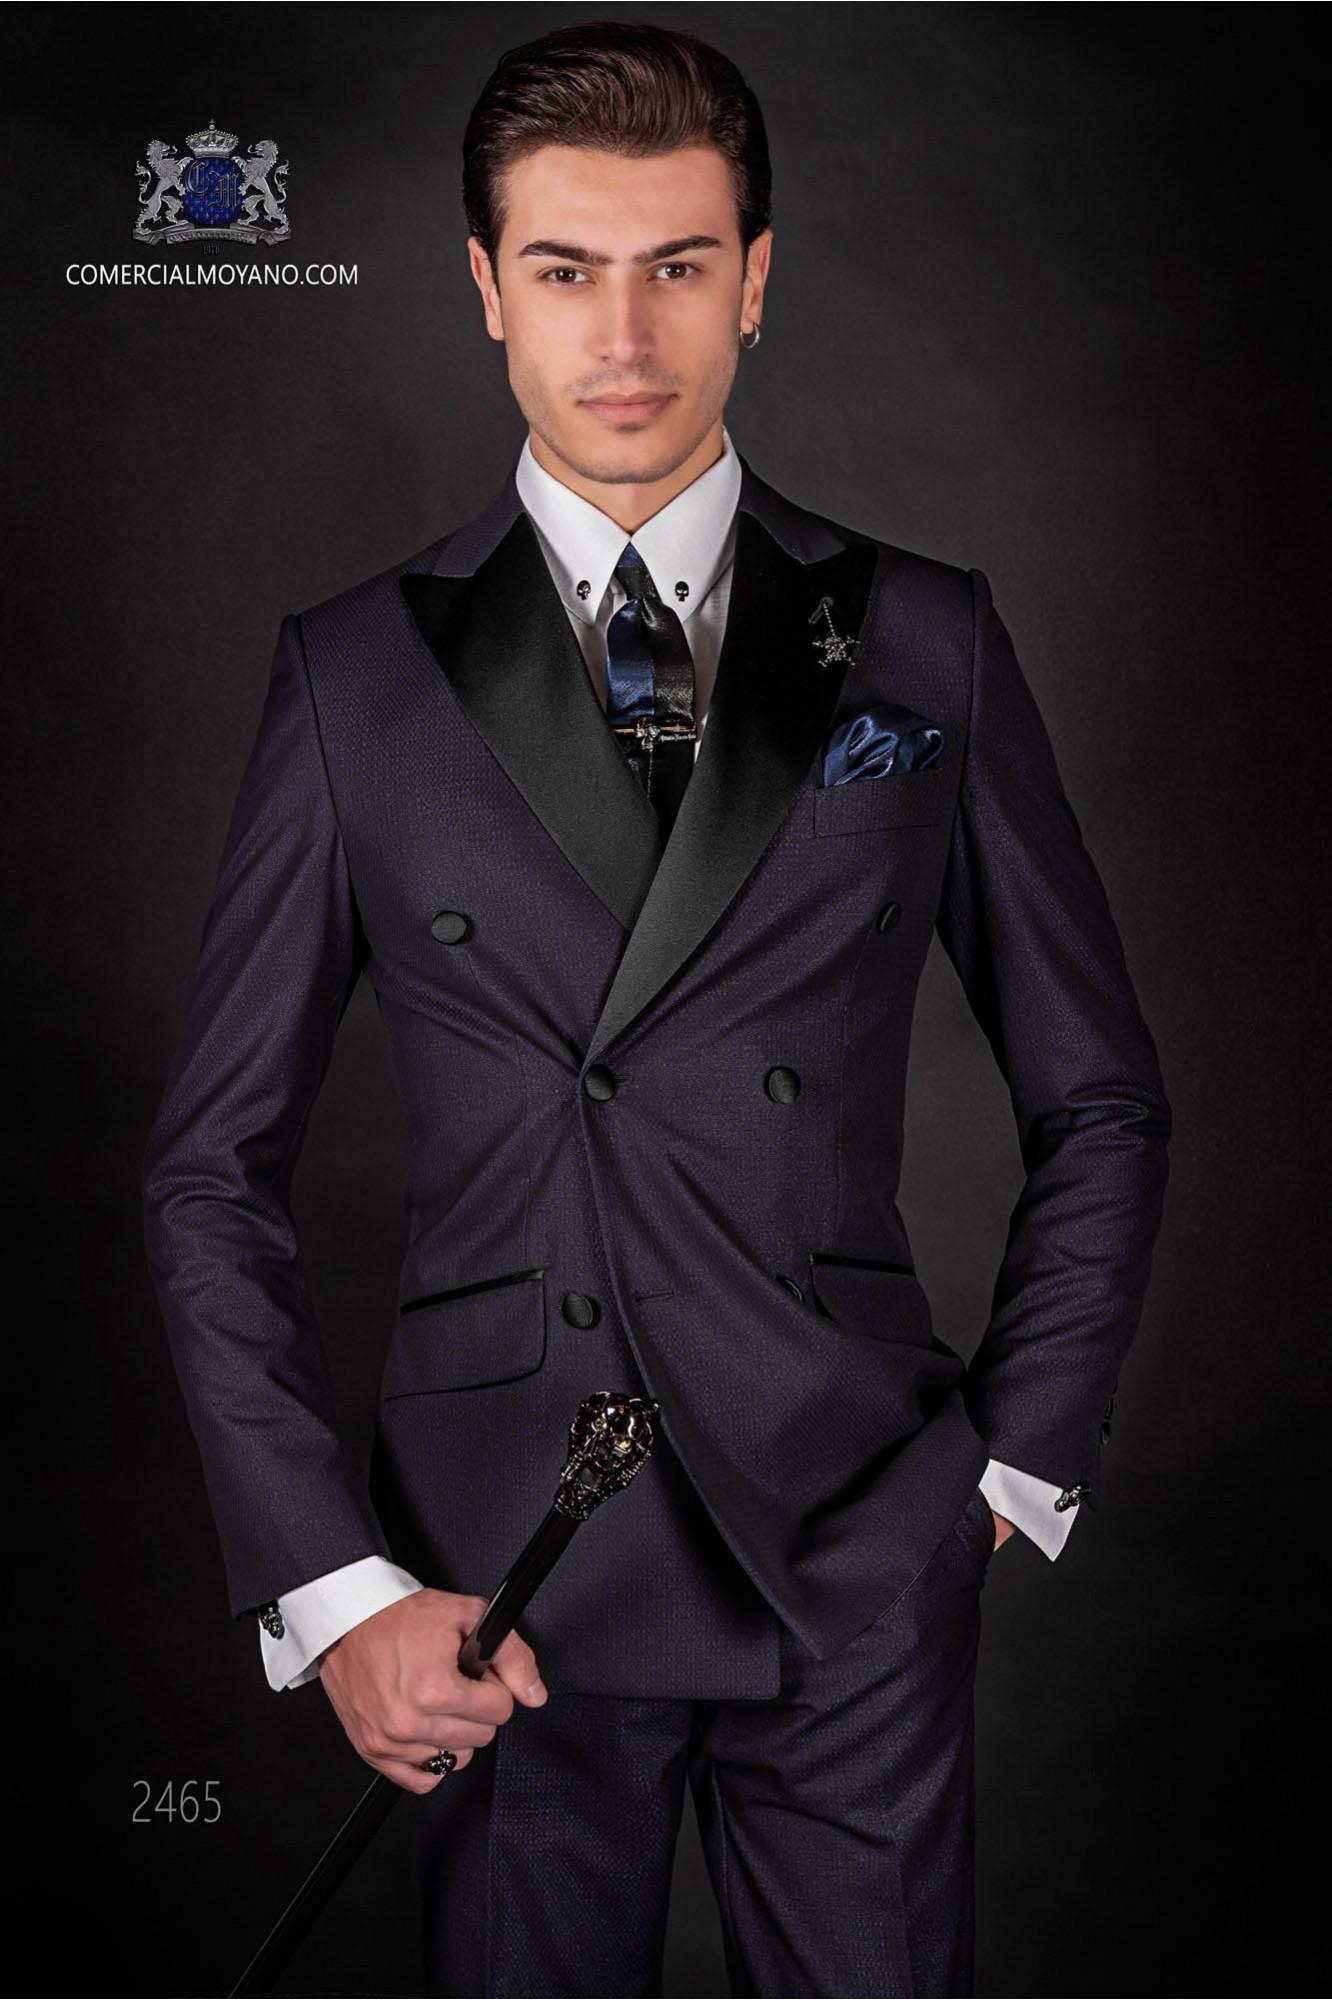 Traje cruzado azul italiano de moda. Modelo cruzado solapa punta con 6 botones. Tejido lurex